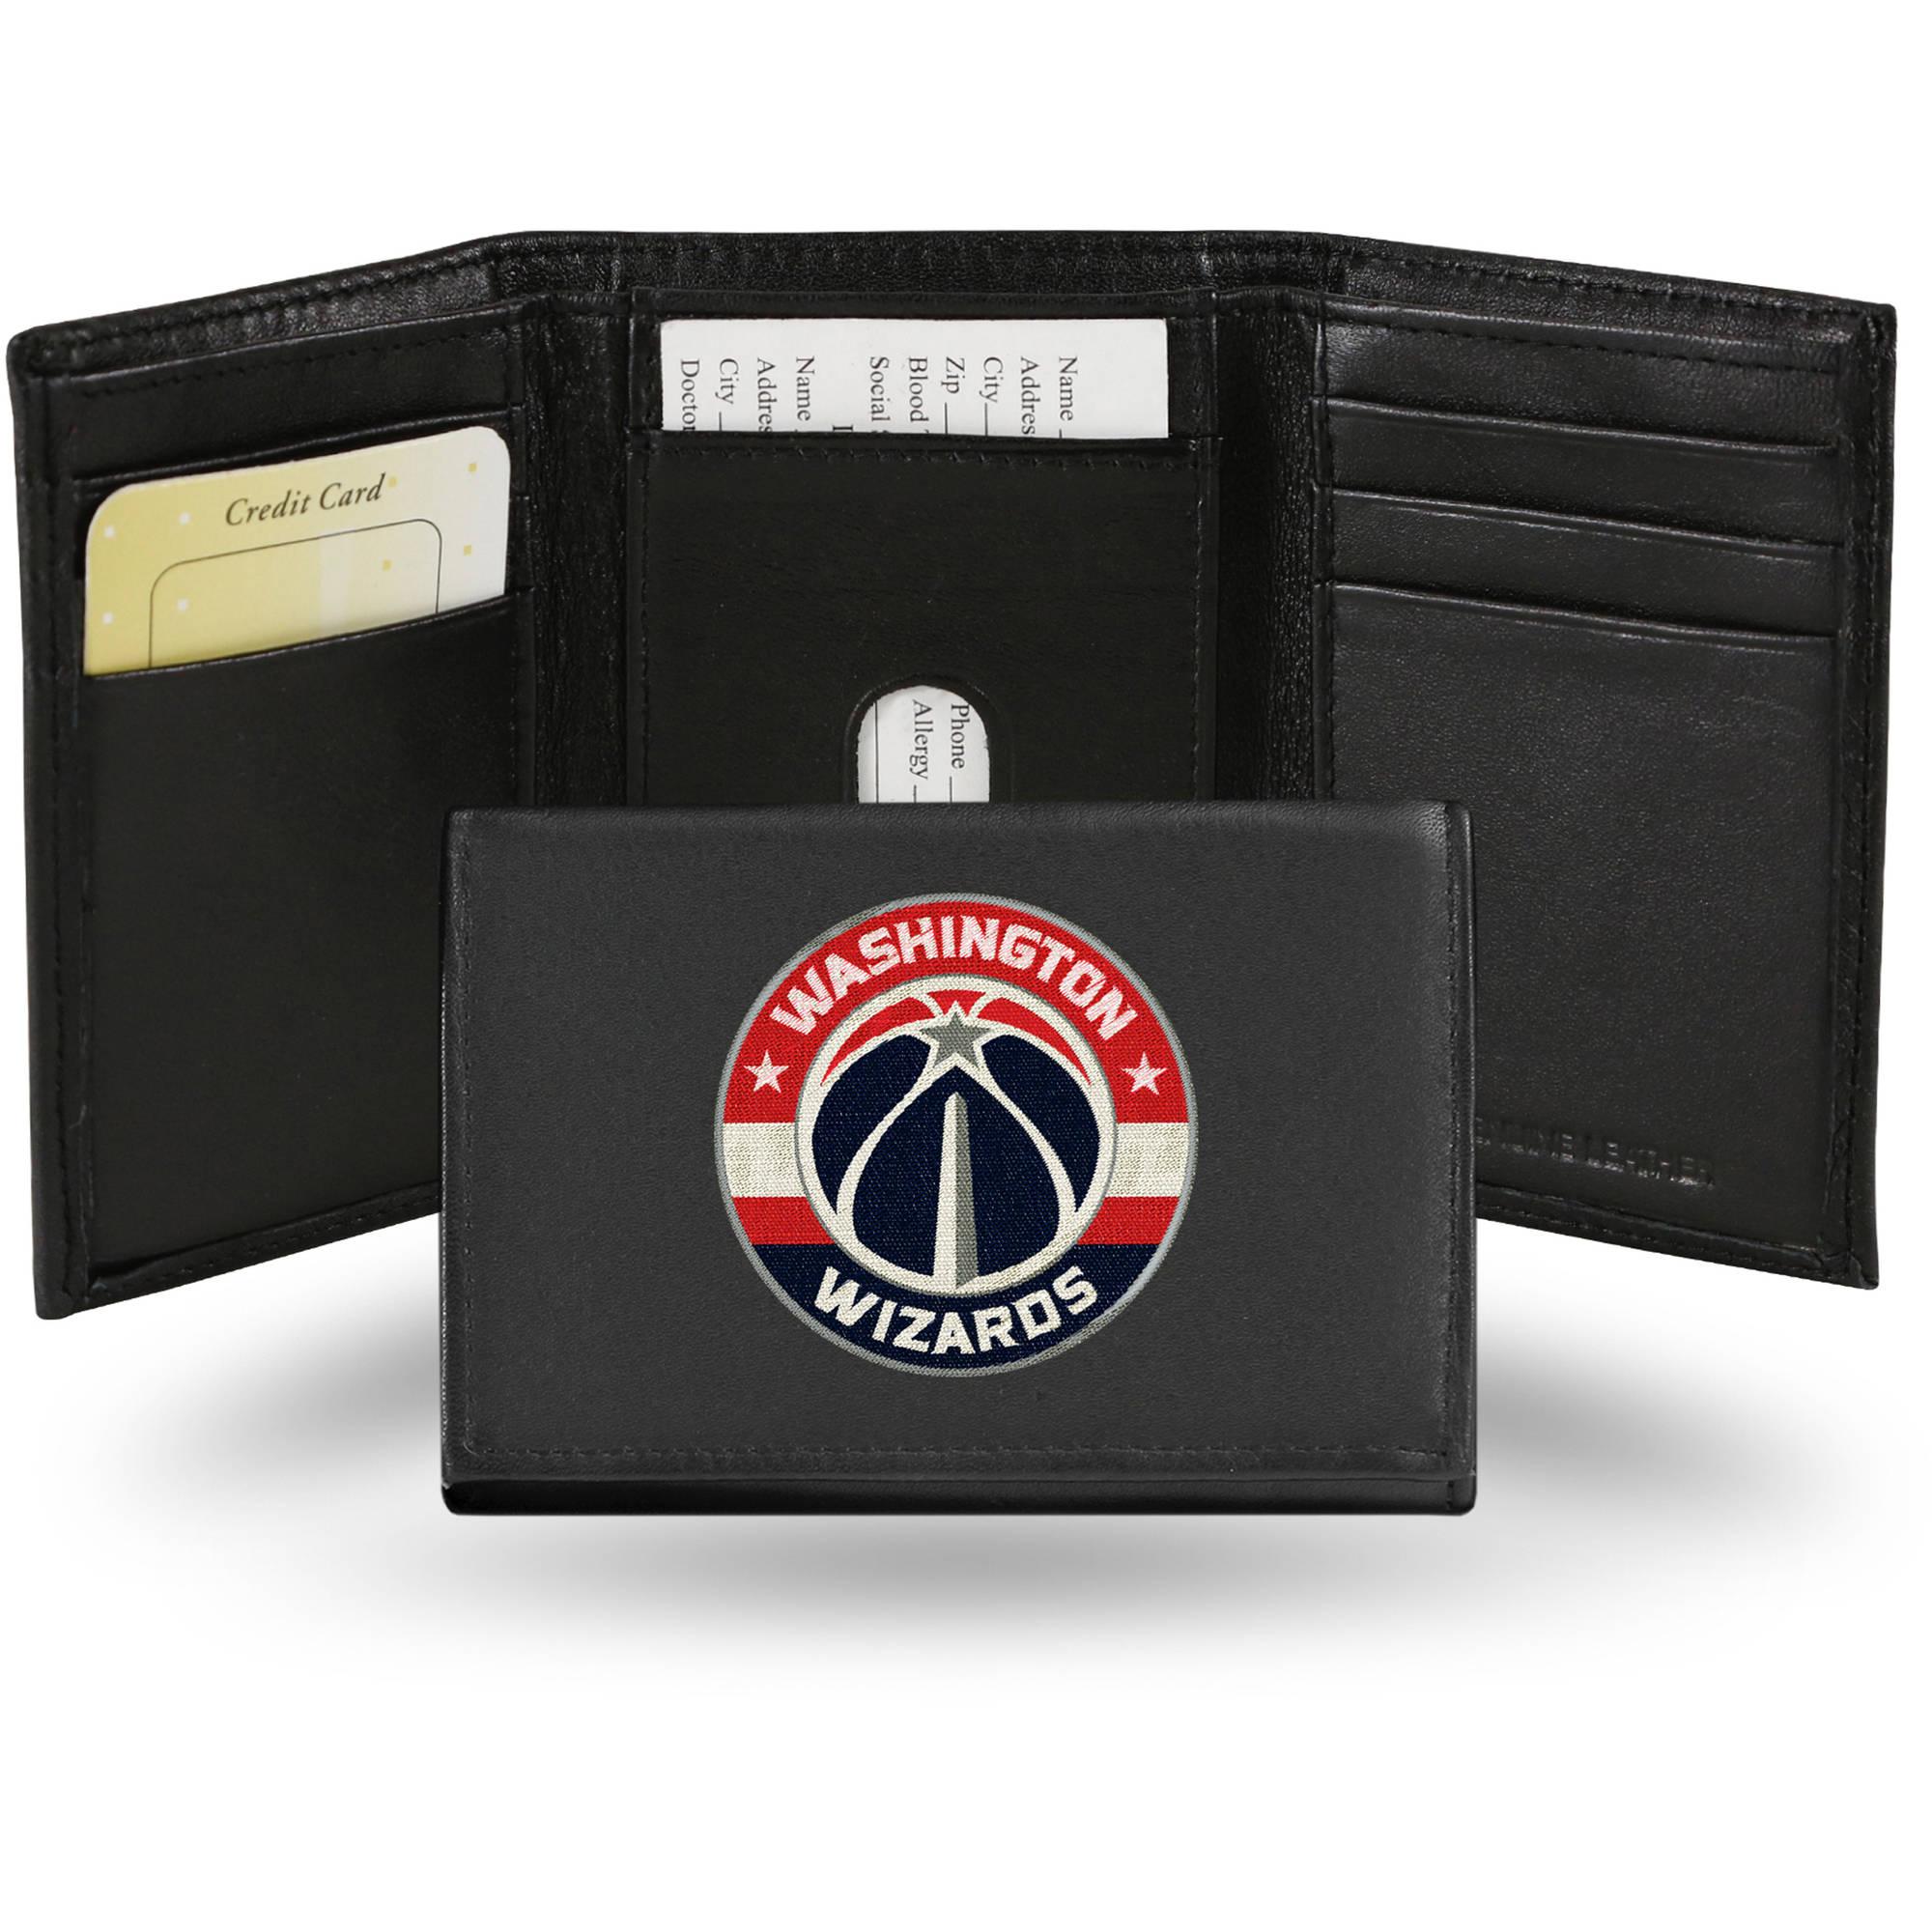 NBA - Men's Washington Wizards Embroidered Trifold Wallet